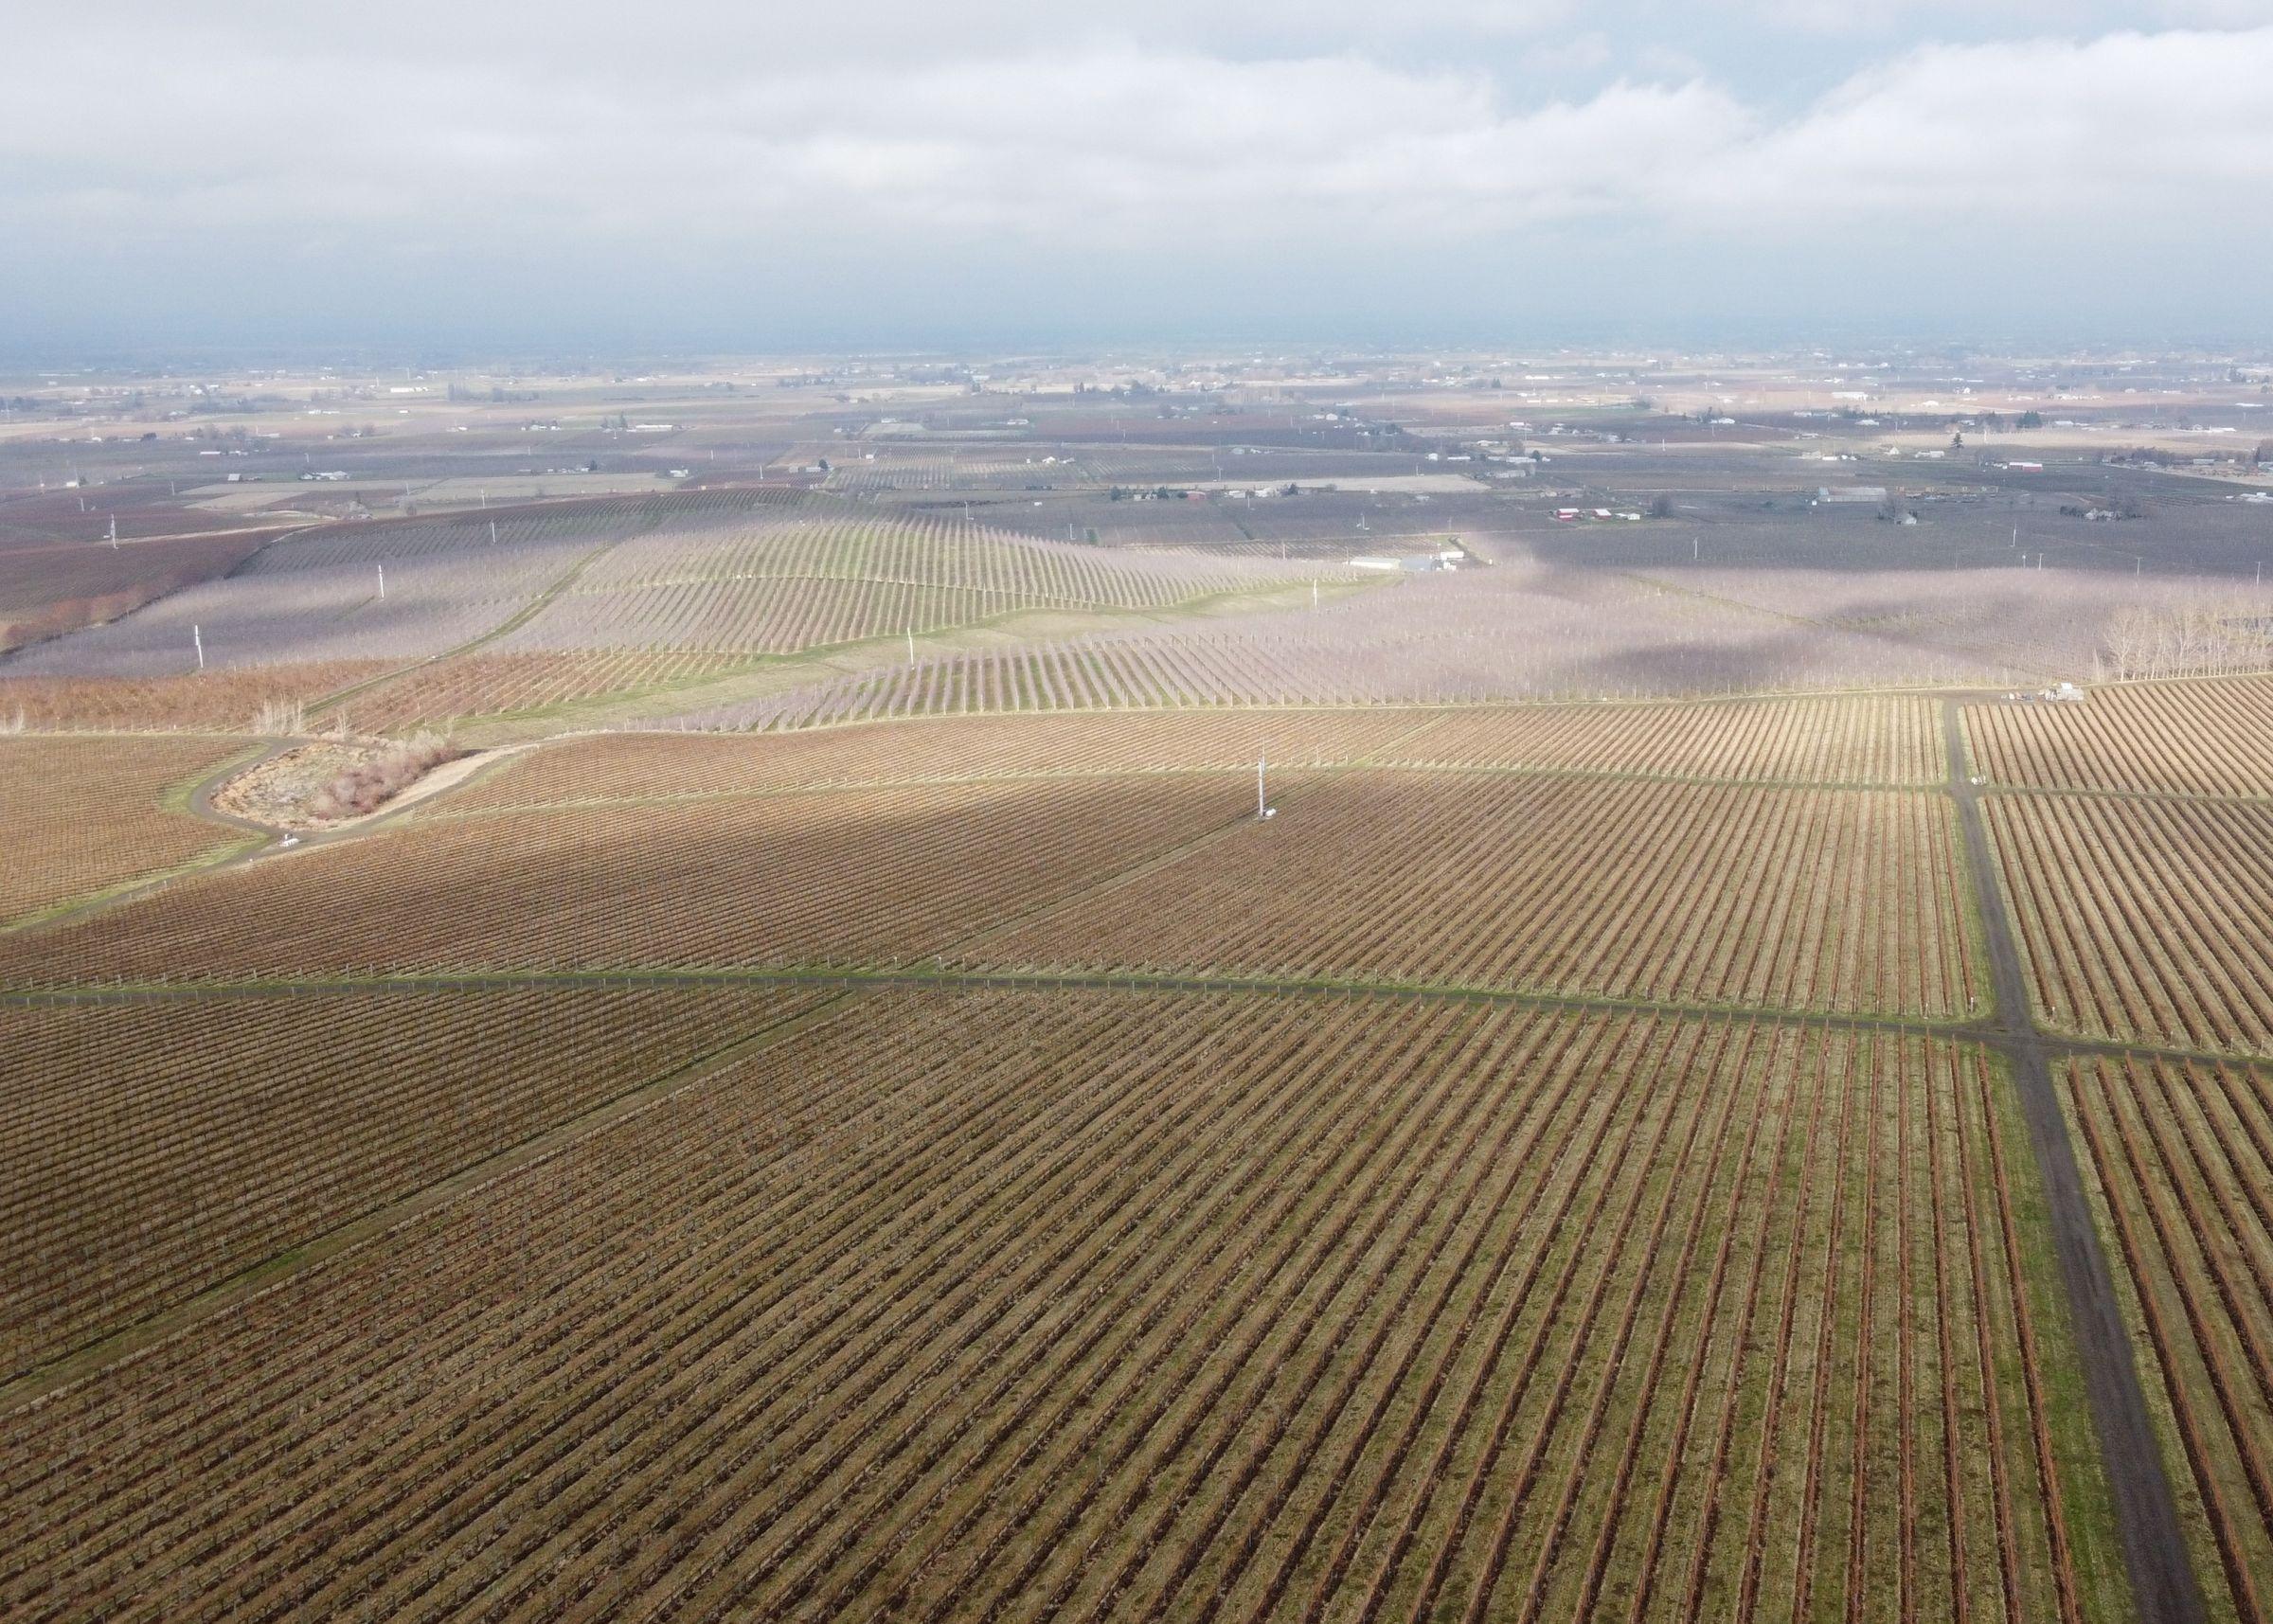 residential-land-polk-county-oregon-65-acres-listing-number-15179-2-2021-03-10-153752.JPG